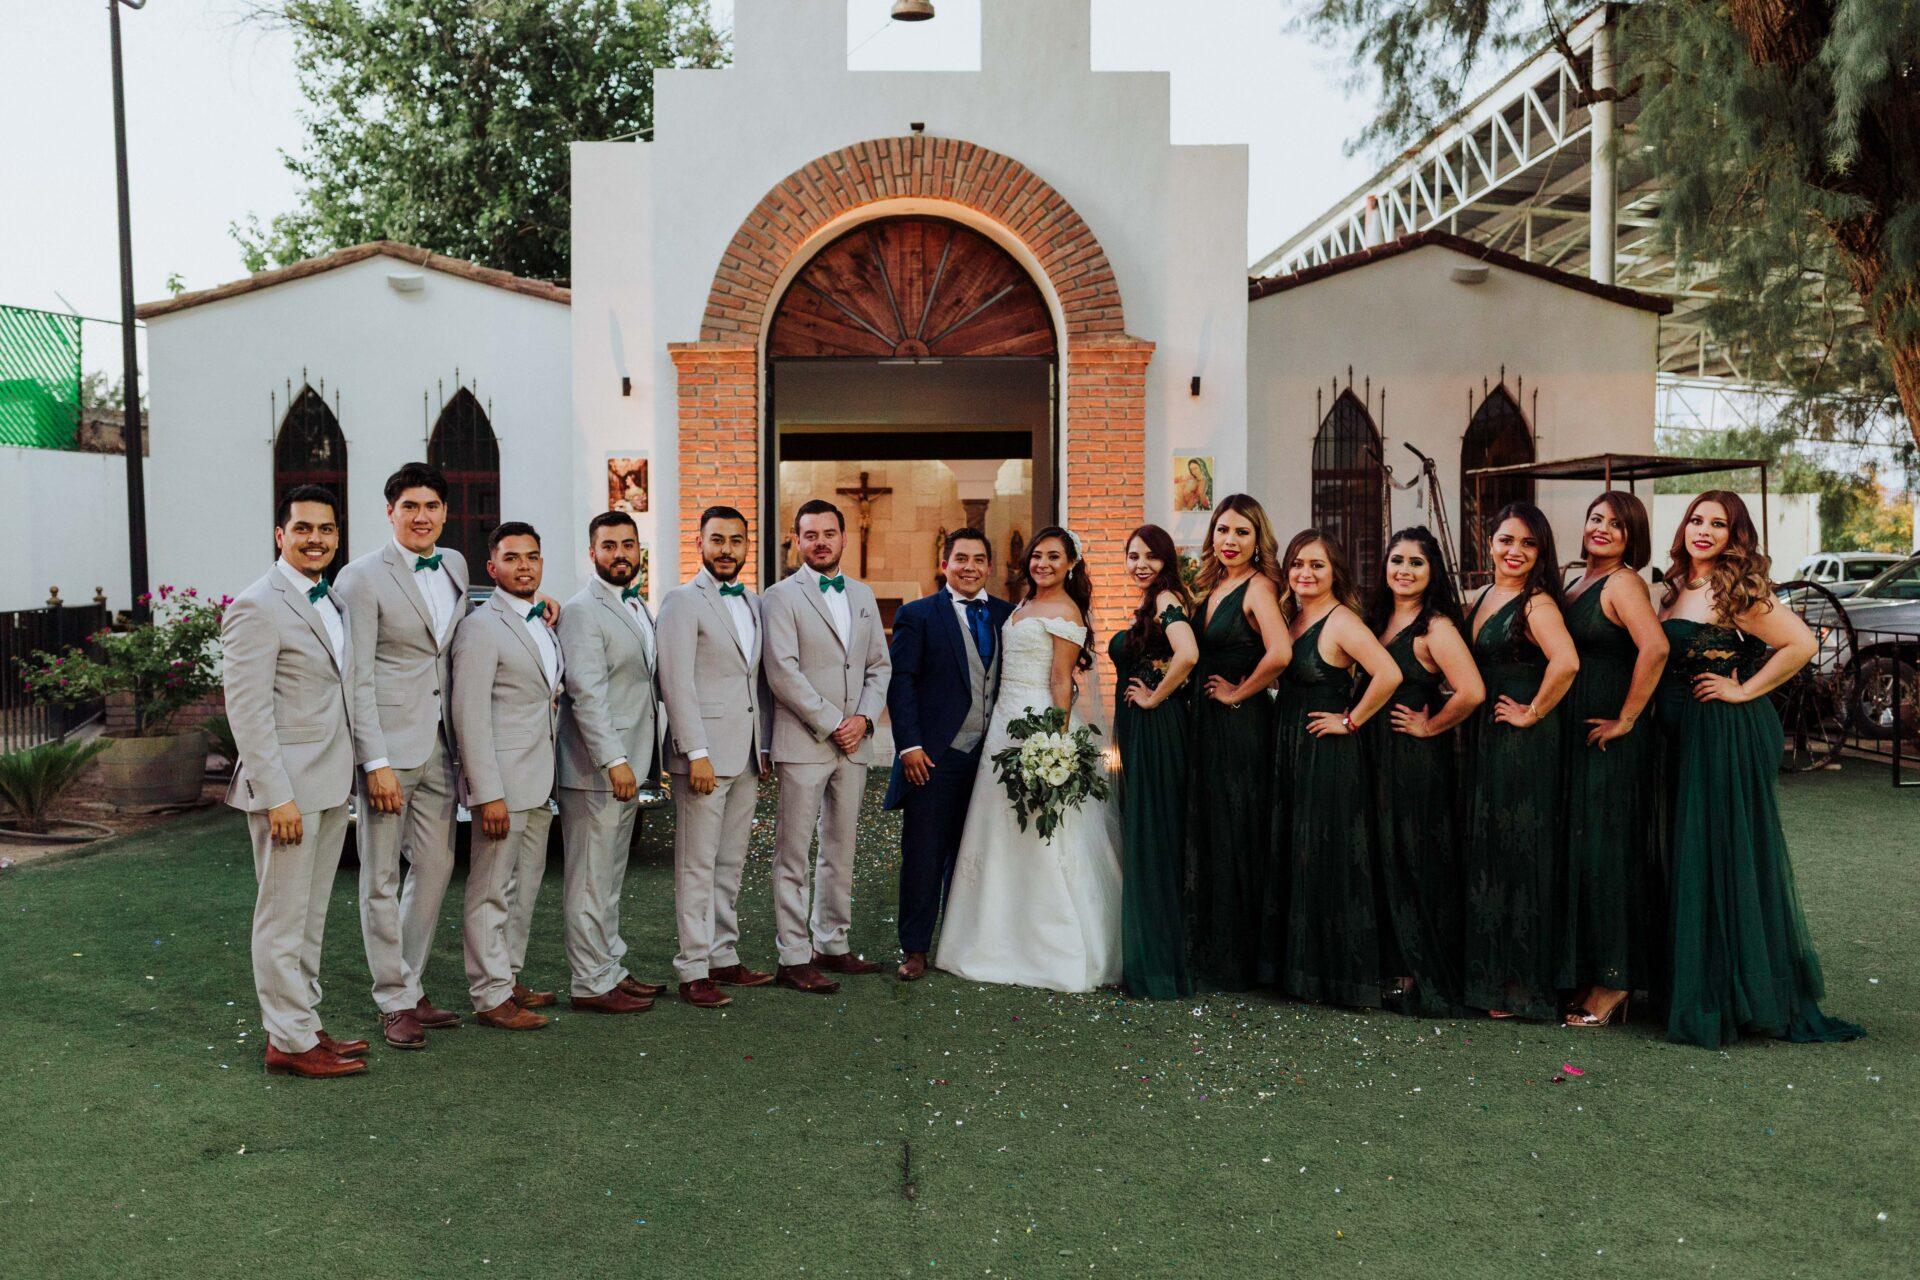 javier_noriega_fotografo_bodas_torreon_coahuila_zacatecas_wedding_photographer50a